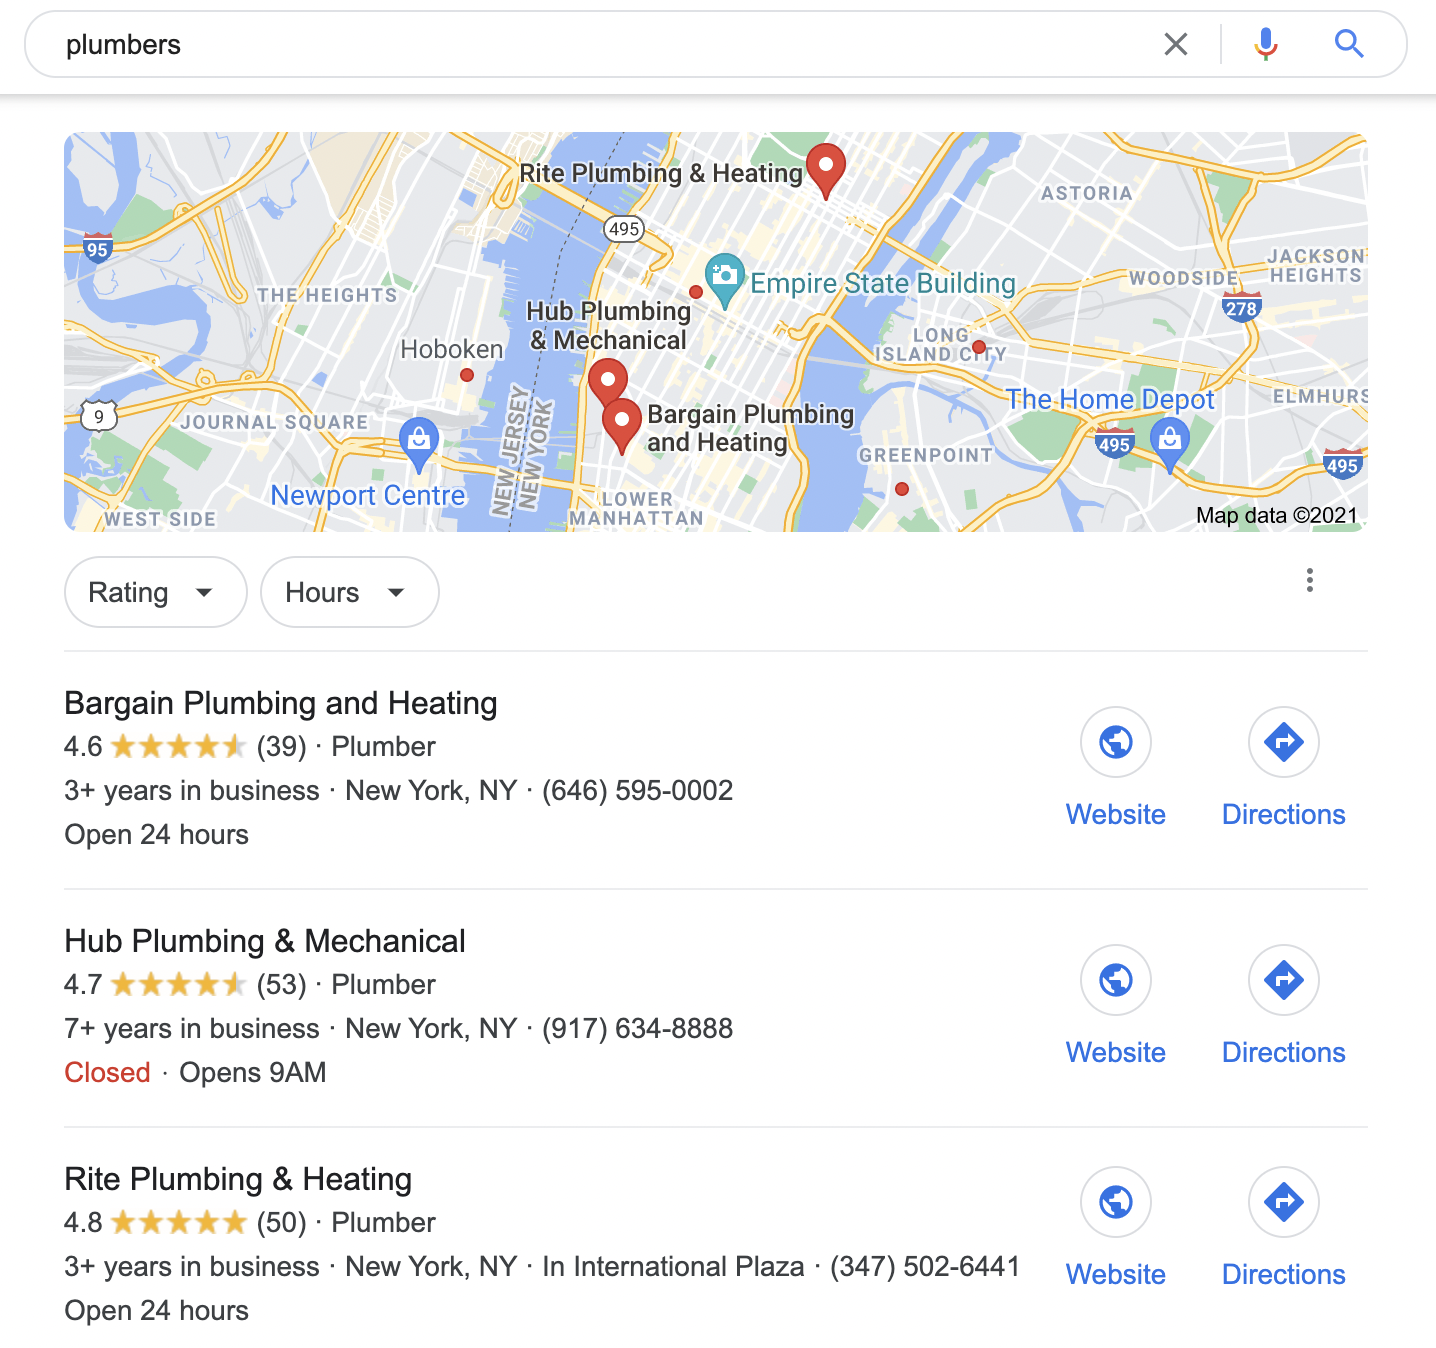 competitors on Google Maps